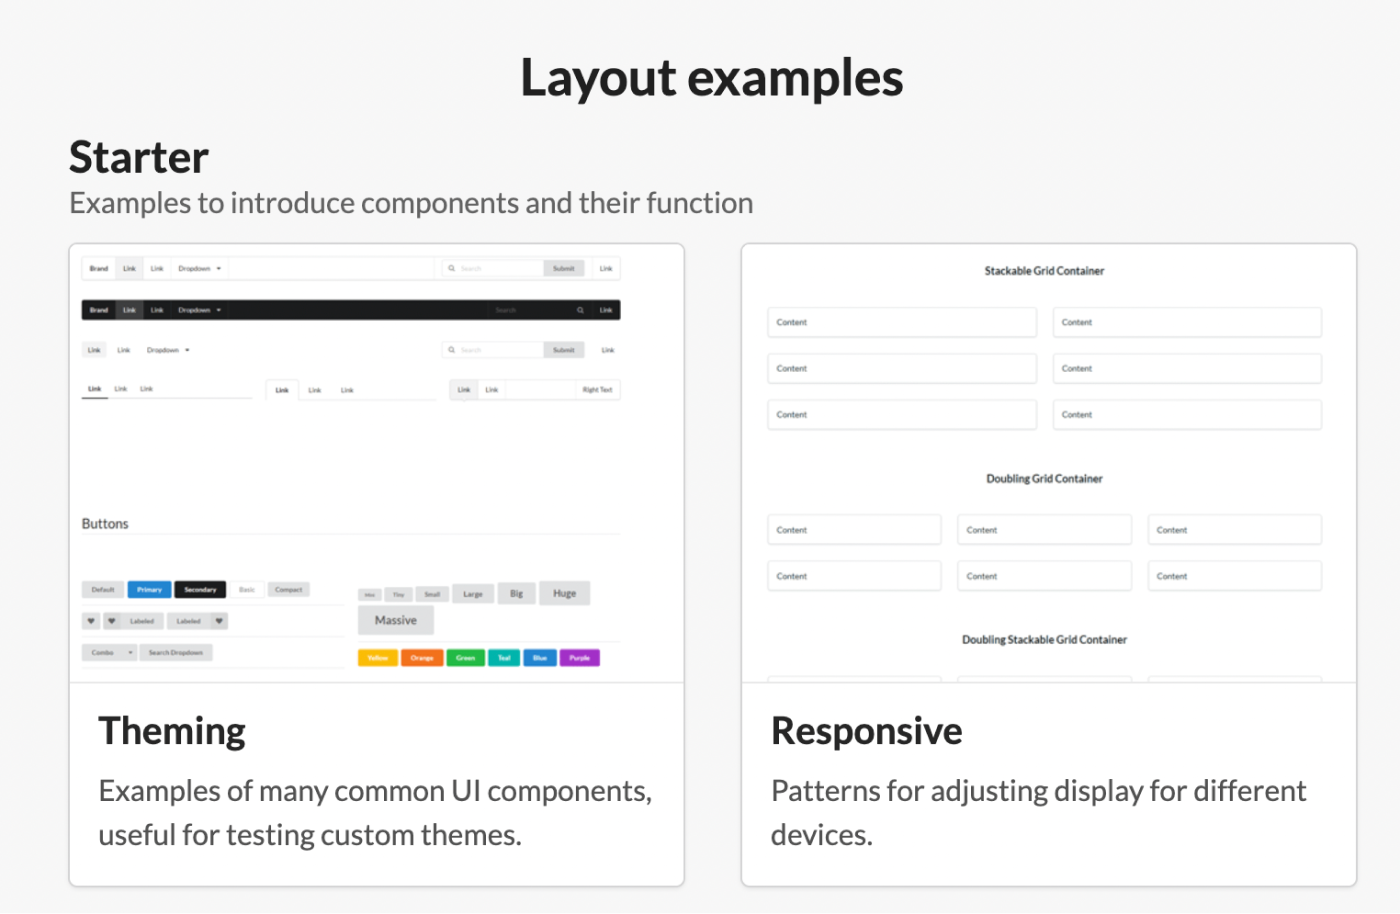 semantic-layout-examples